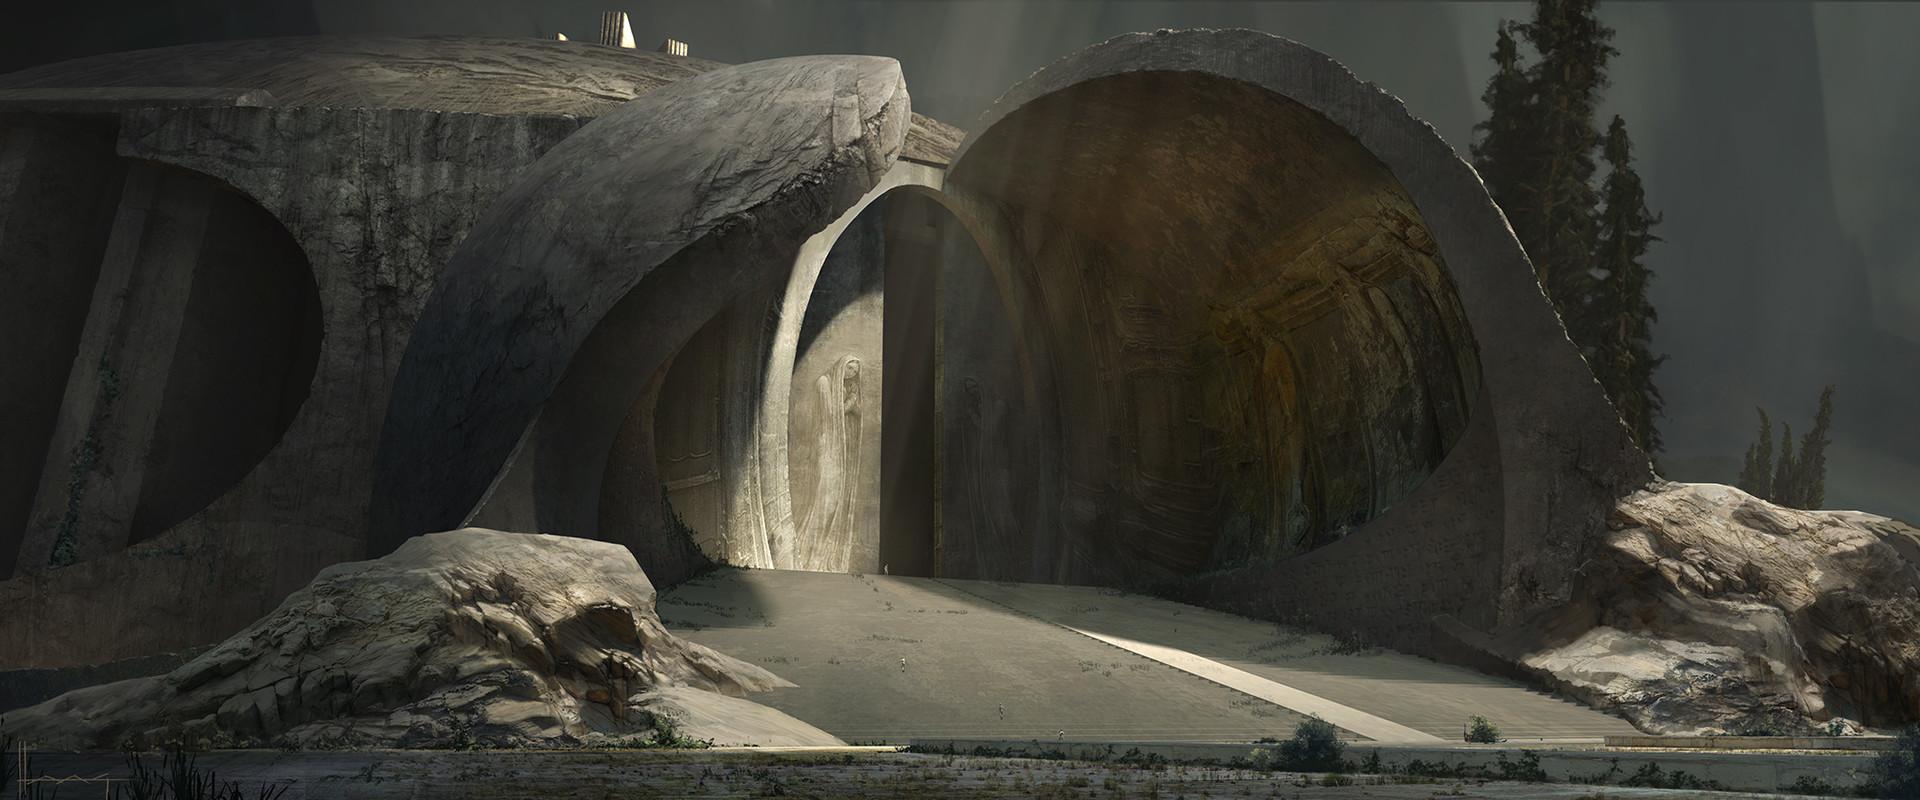 Wayne Haag Shares Remarkable Alien Covenant Concept Art